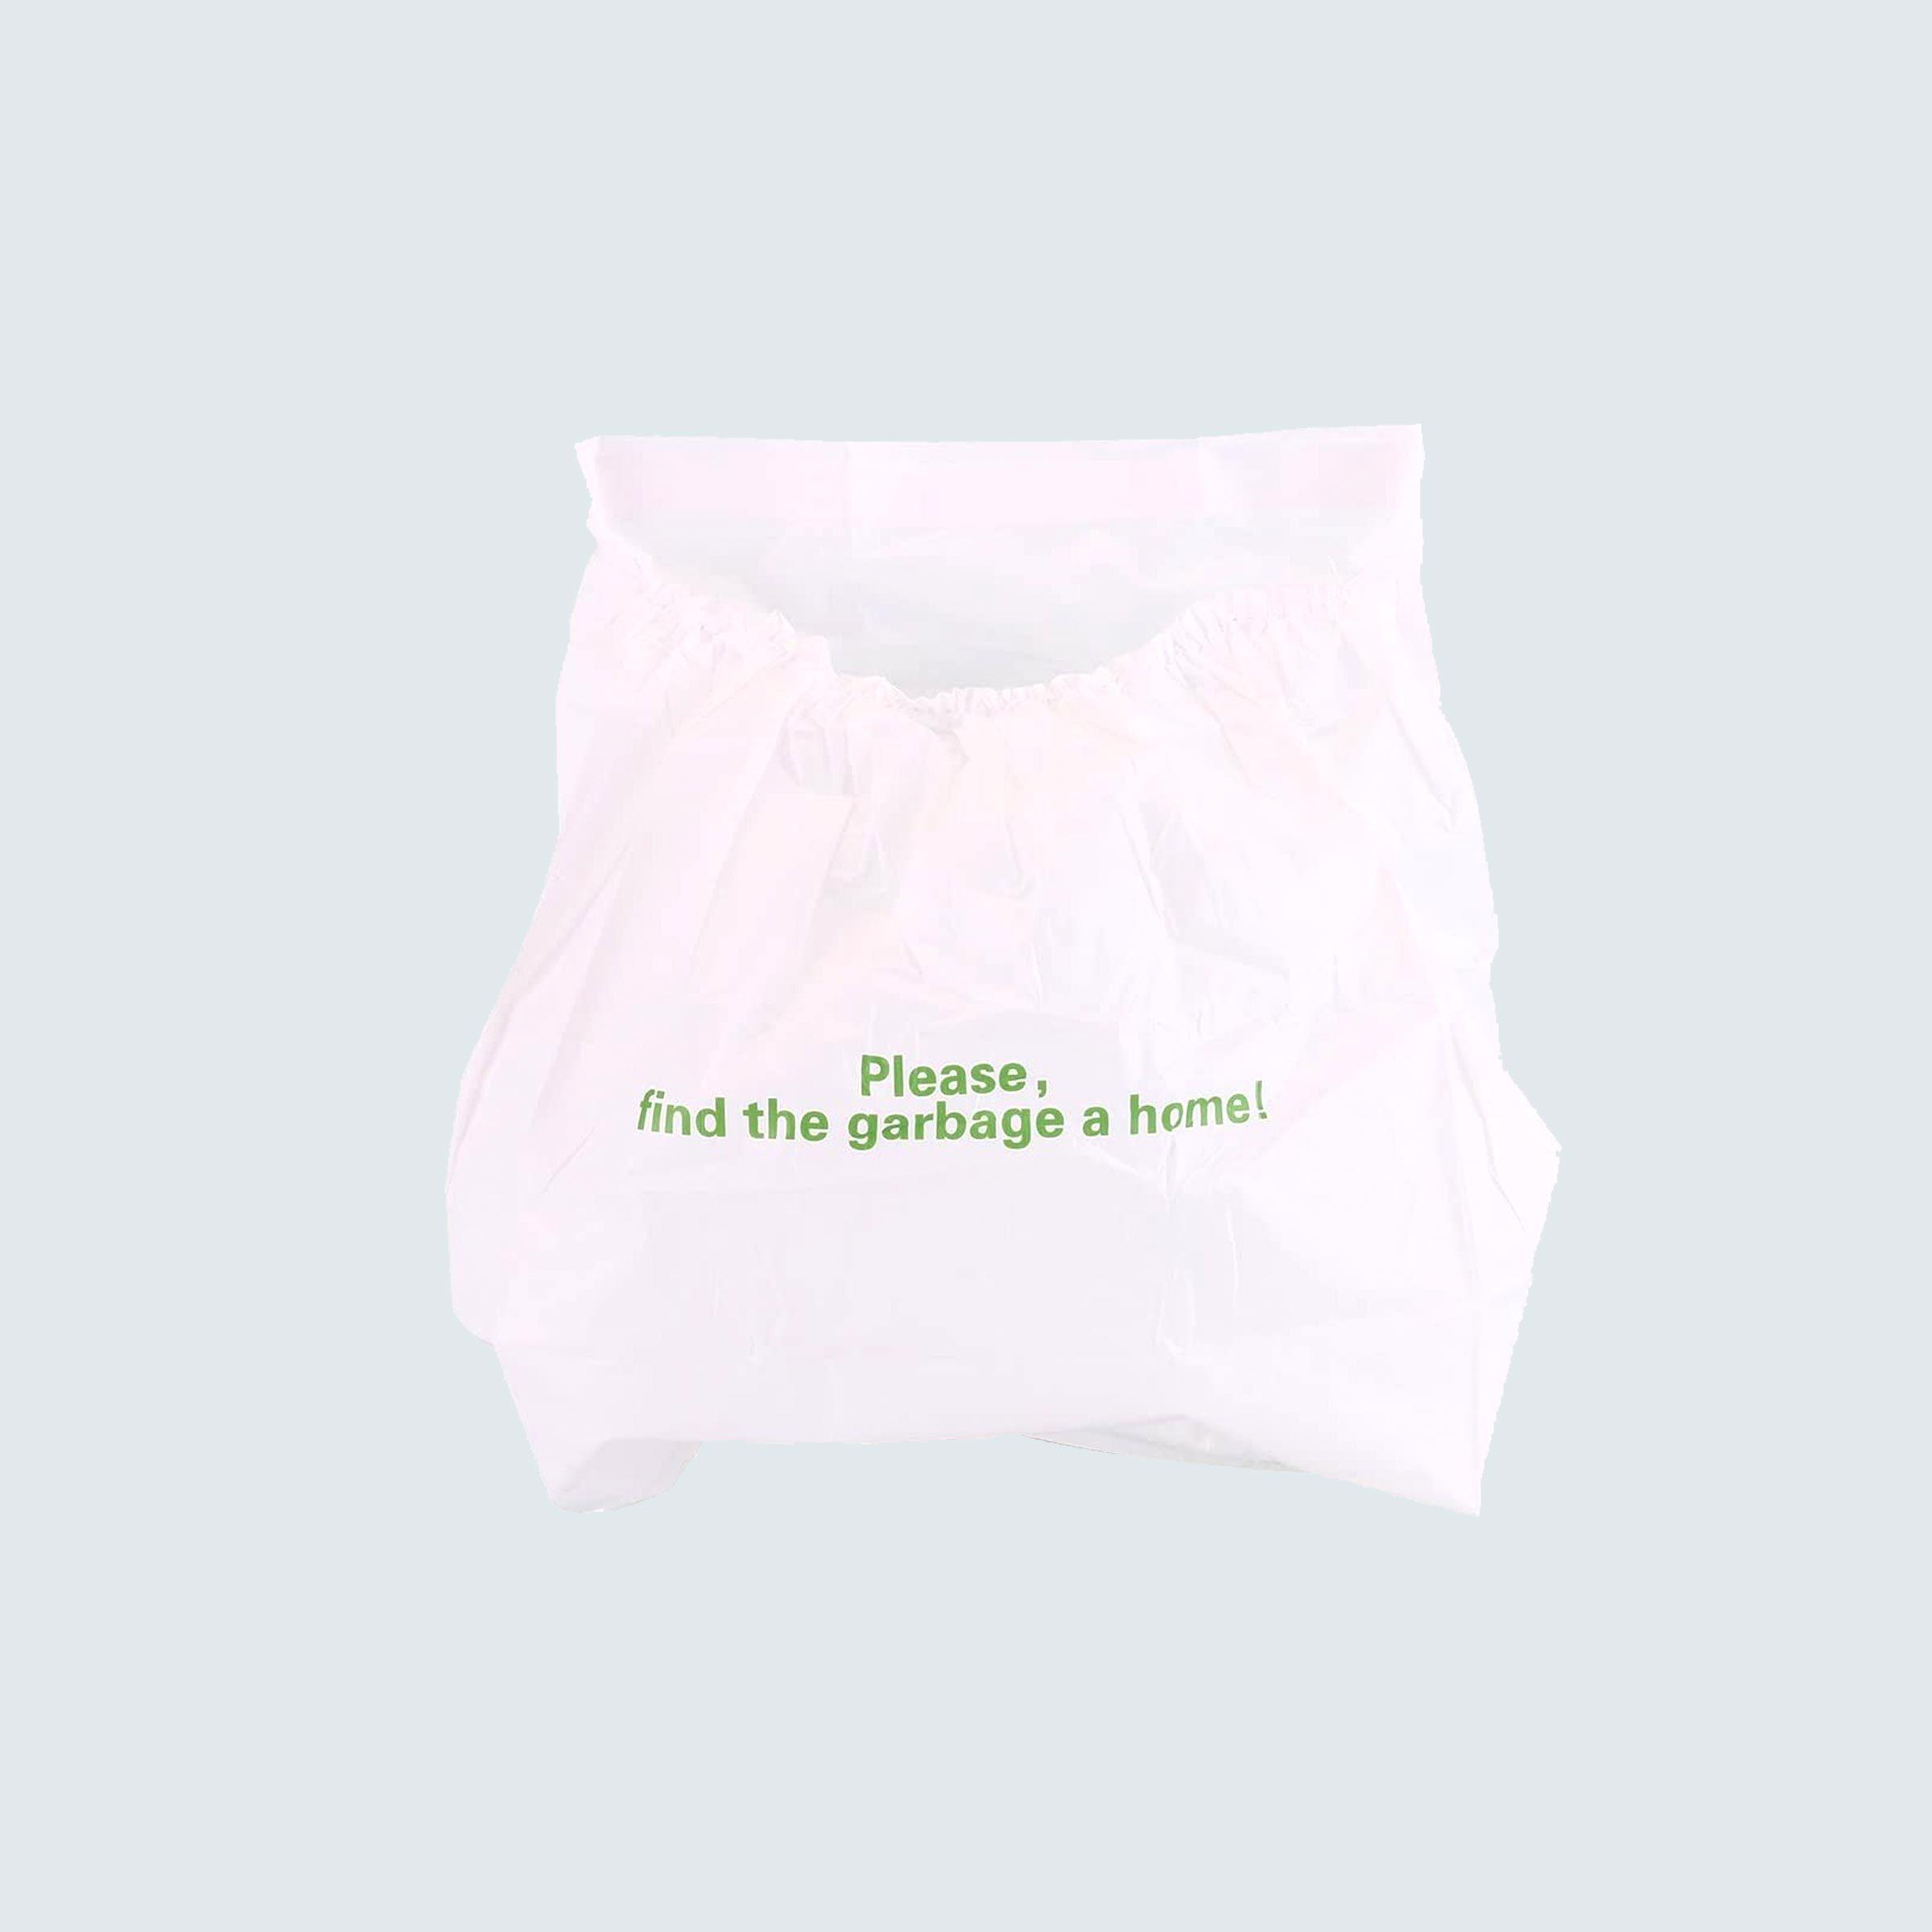 Car trash bags